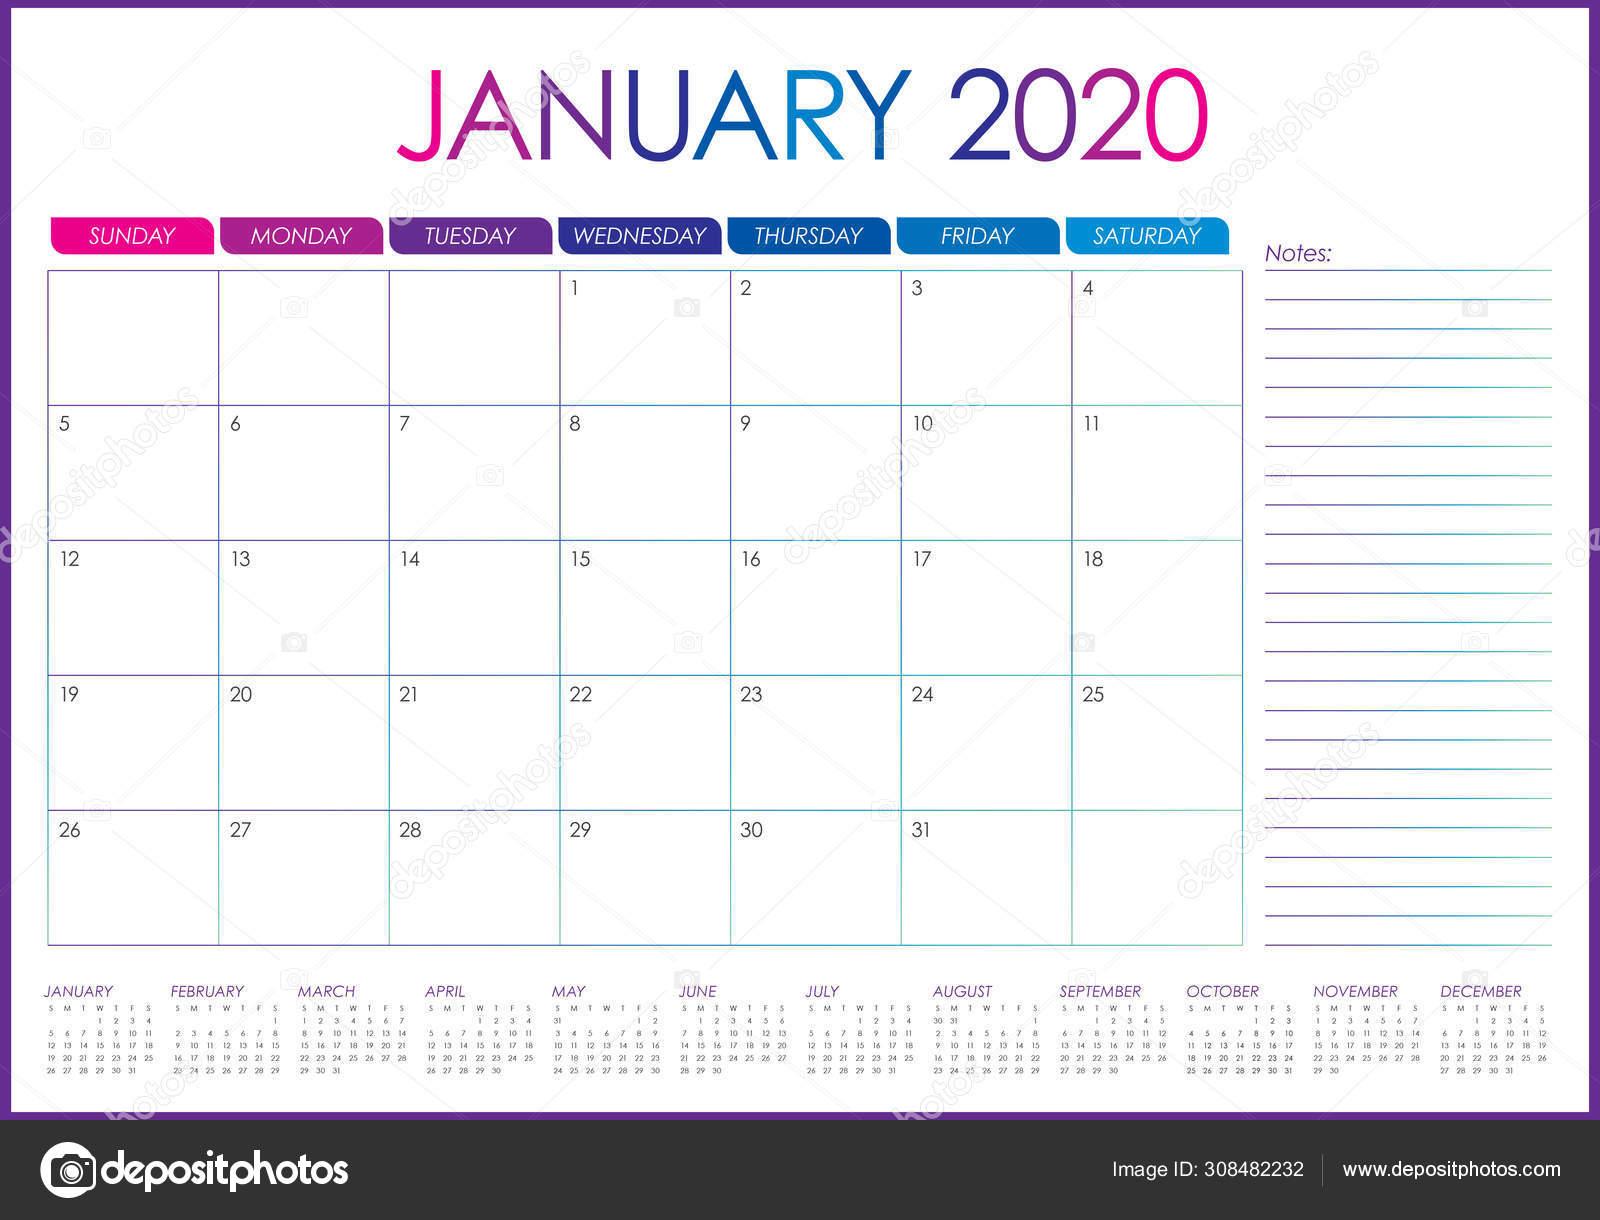 January 2020 desk calendar vector illustration — Stock Vector © dolphfynlow #308482232